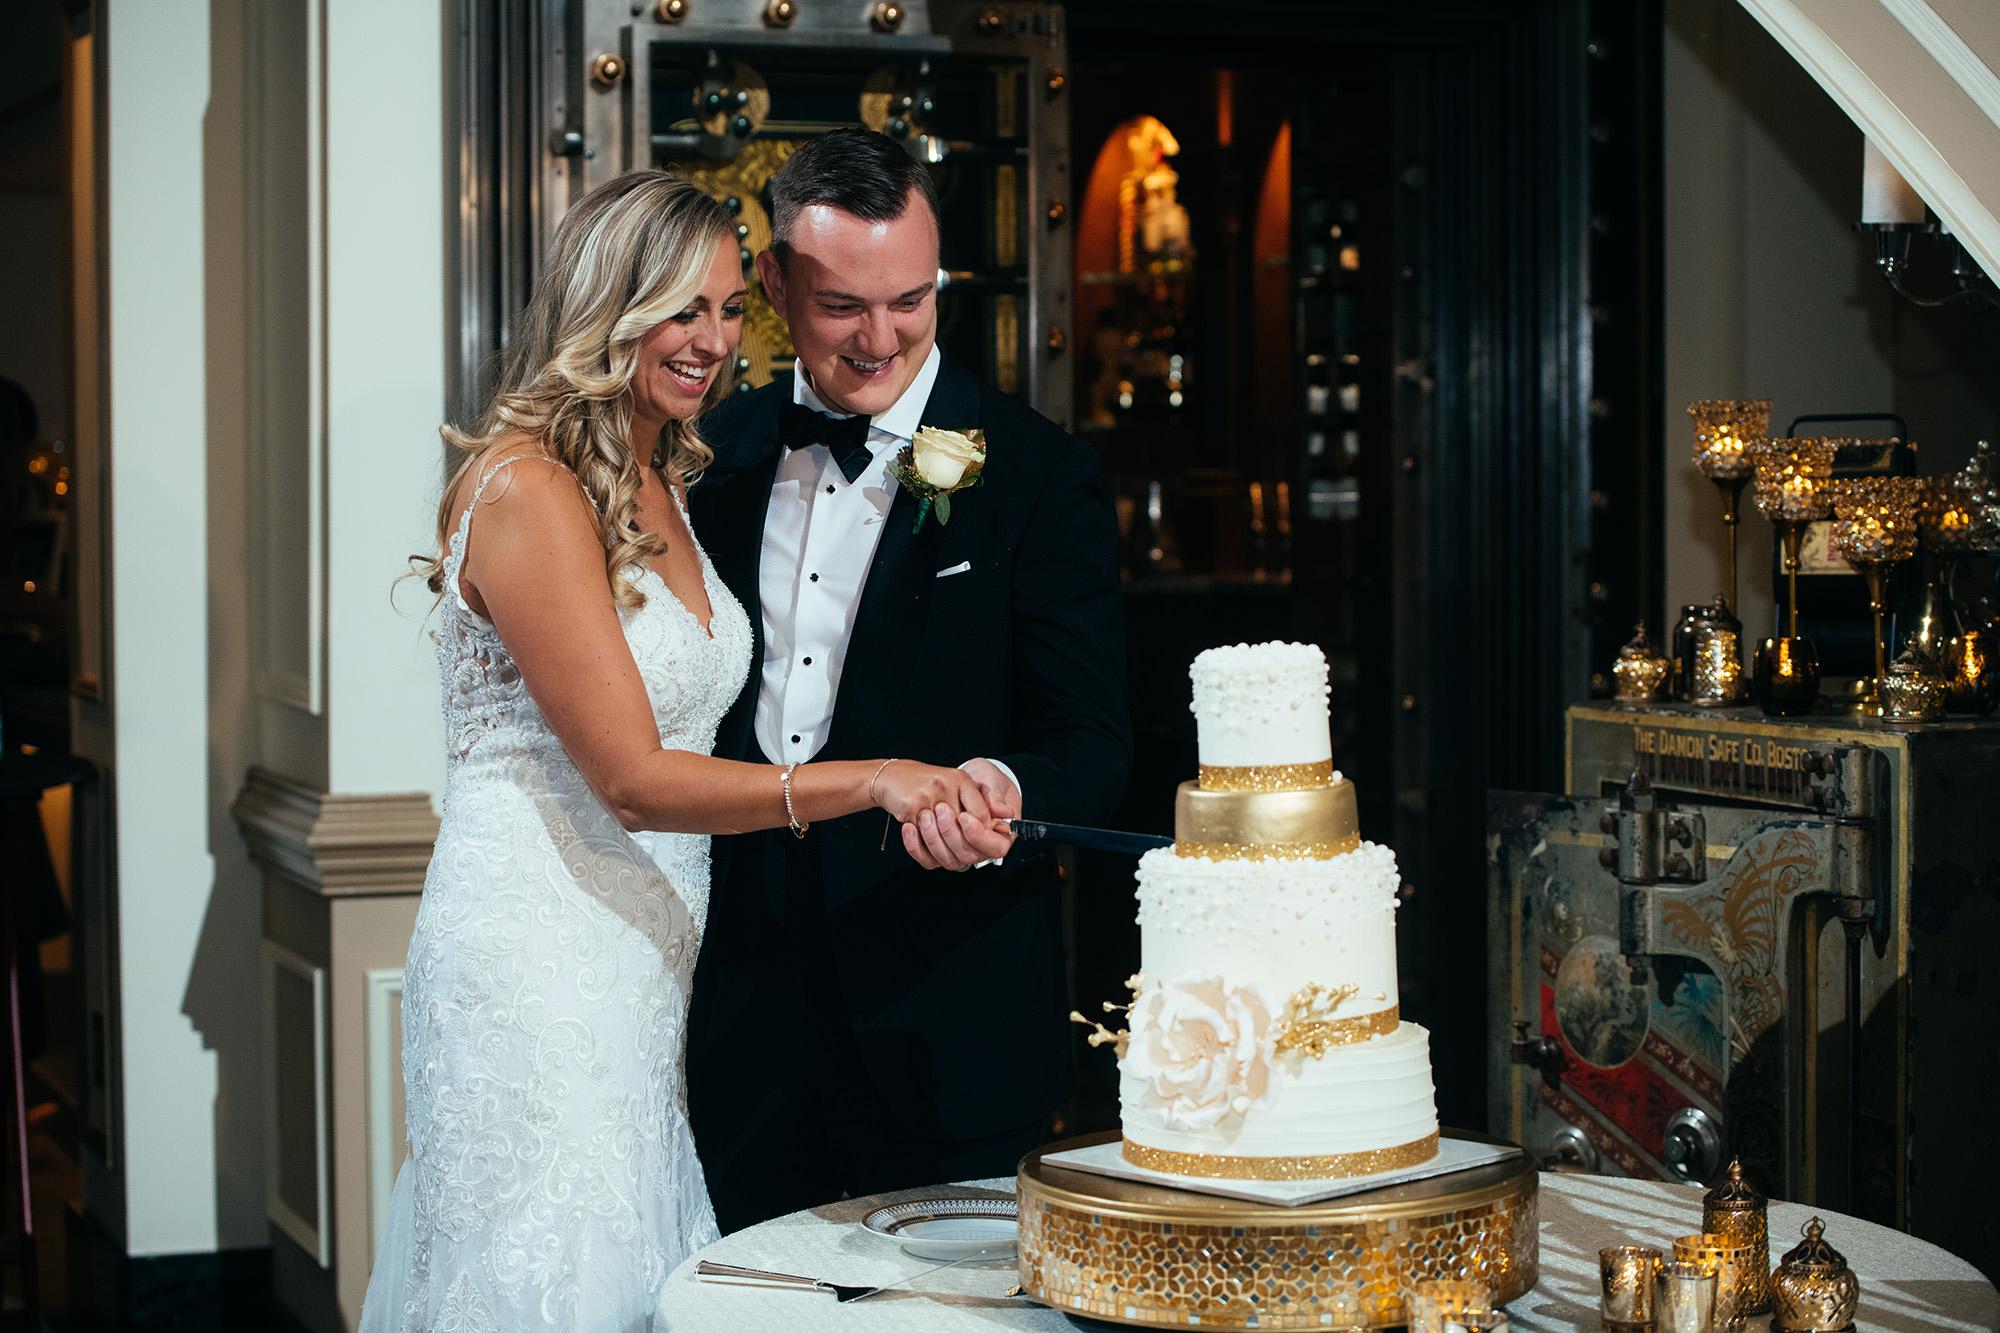 Kimberly And Ryan Cutting Cake